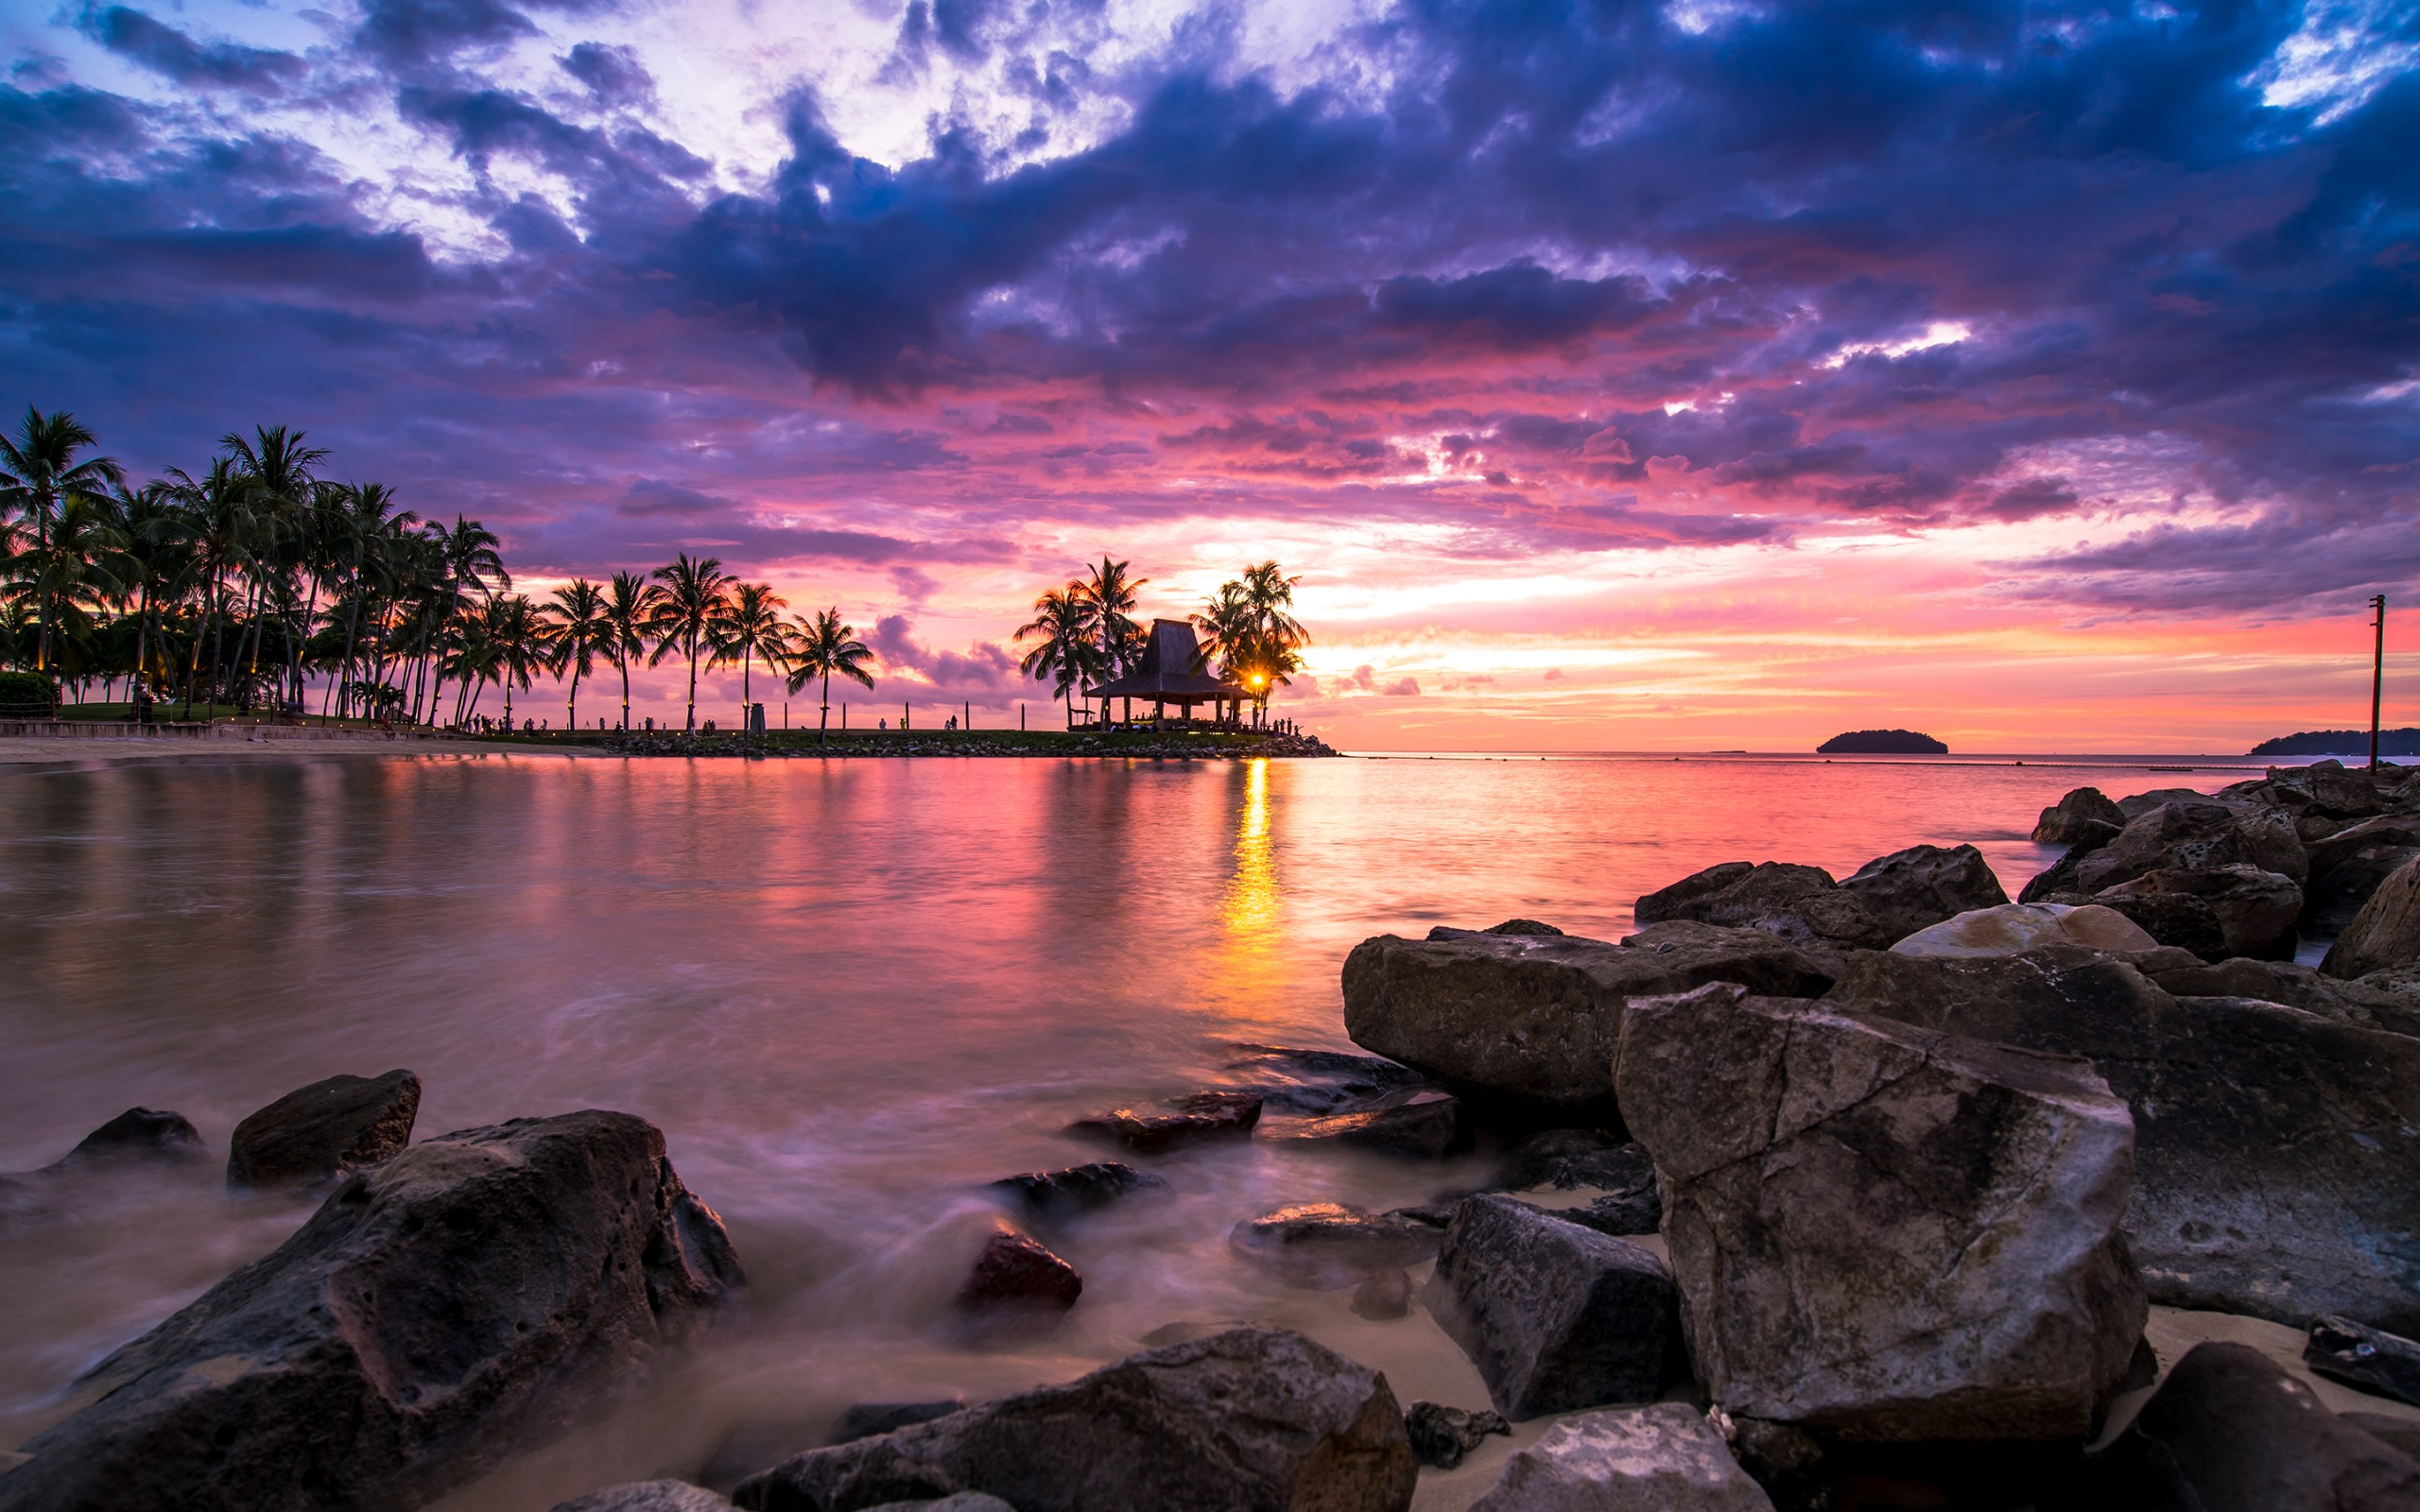 Sunset Beach Resort 13 Retina Macbook Pro Hd Wallpaper